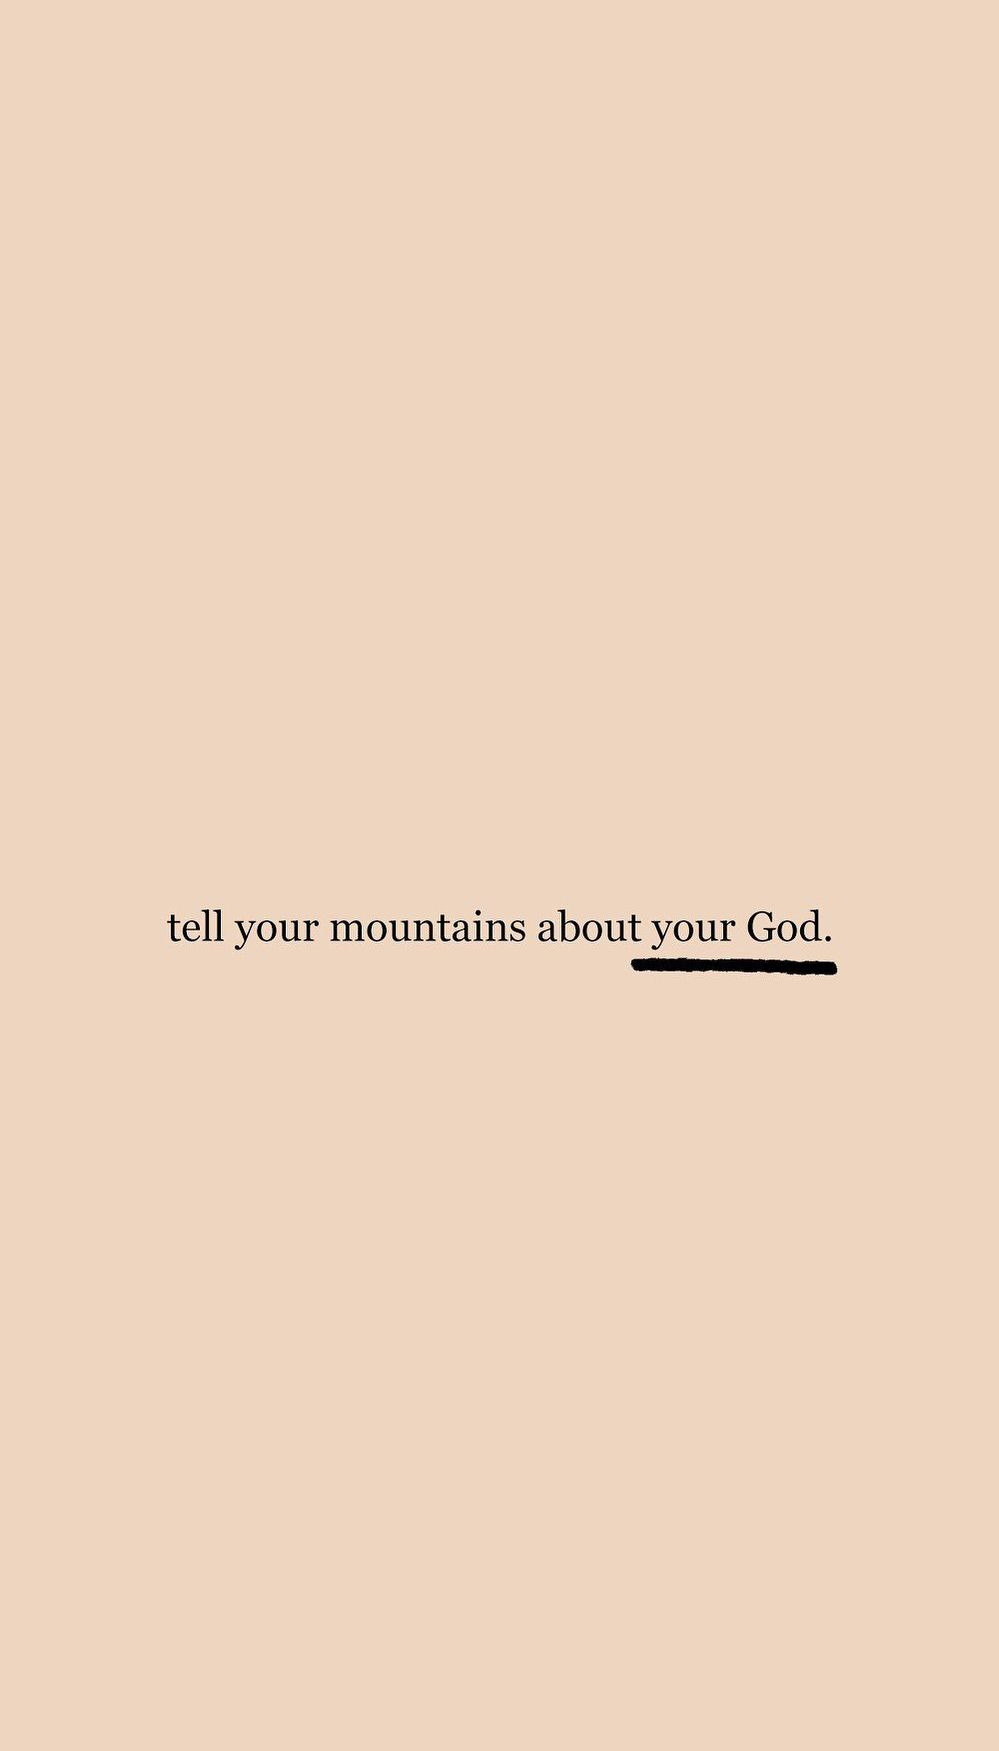 If youve got a mountain, Gods got a word